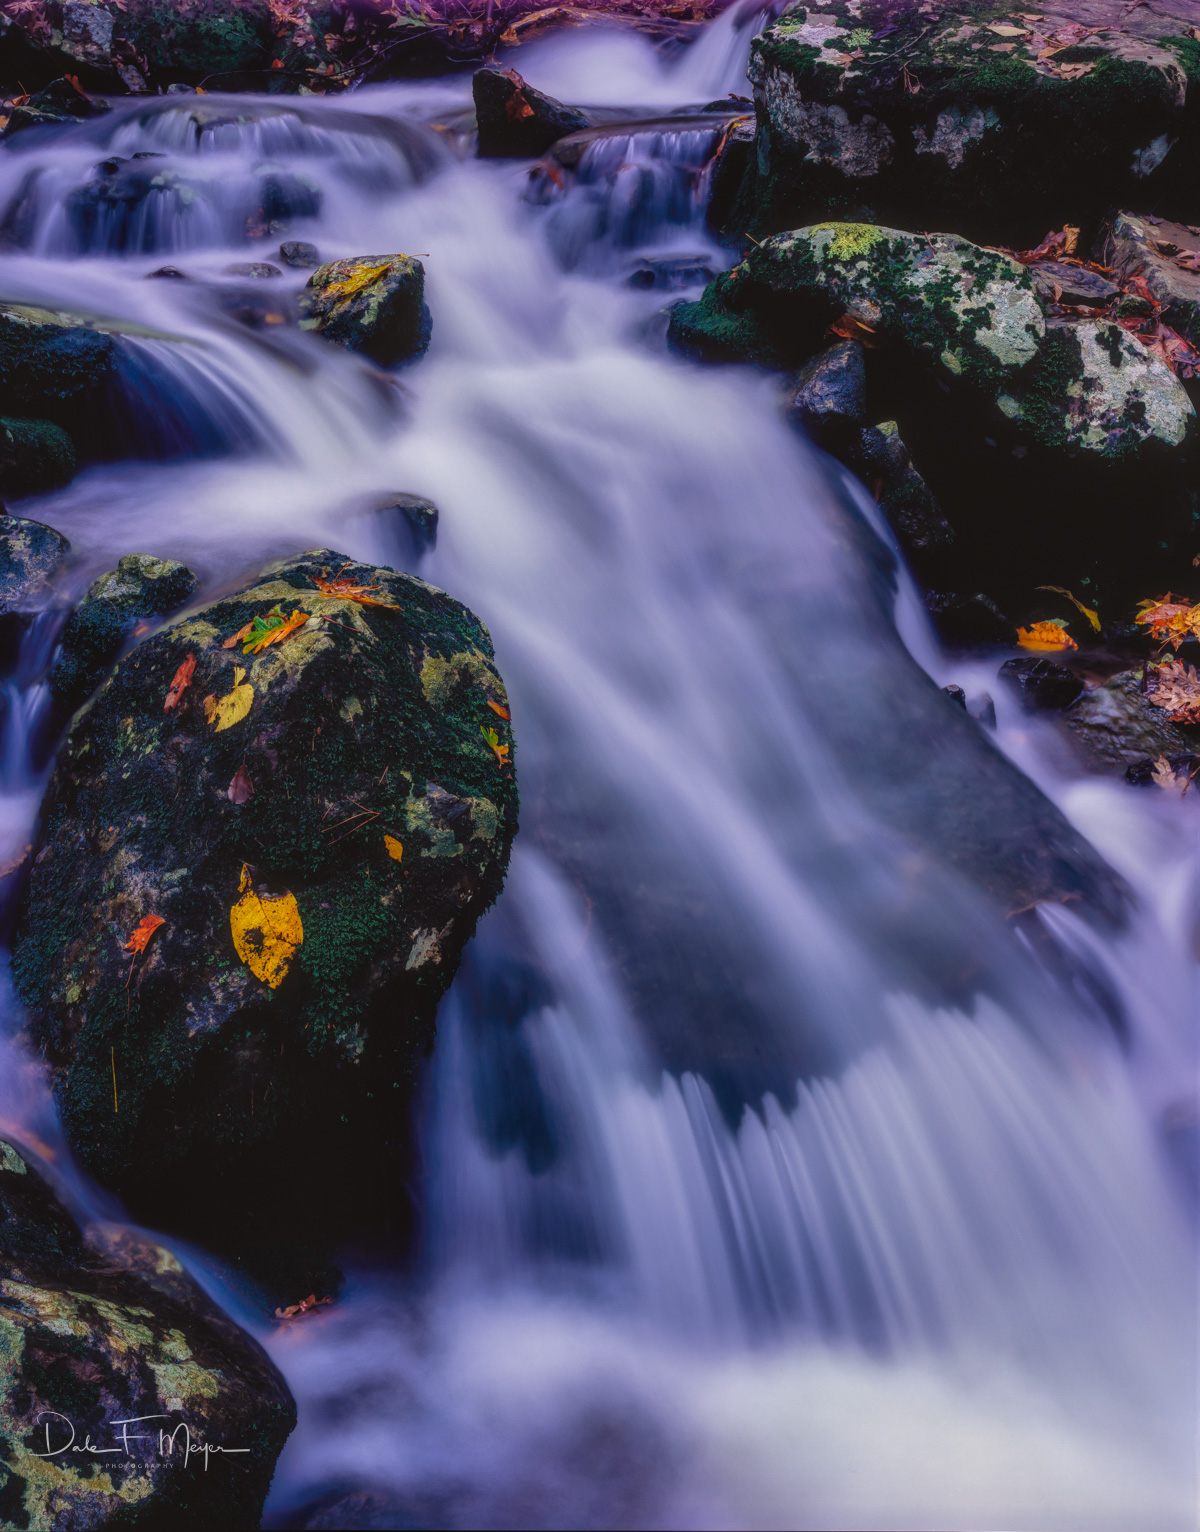 4X5 Fuji 50 Slide Film, Thunder Canyon, buffalo National river, rivers streams and waterfalls gallerie, spring 2009, photo